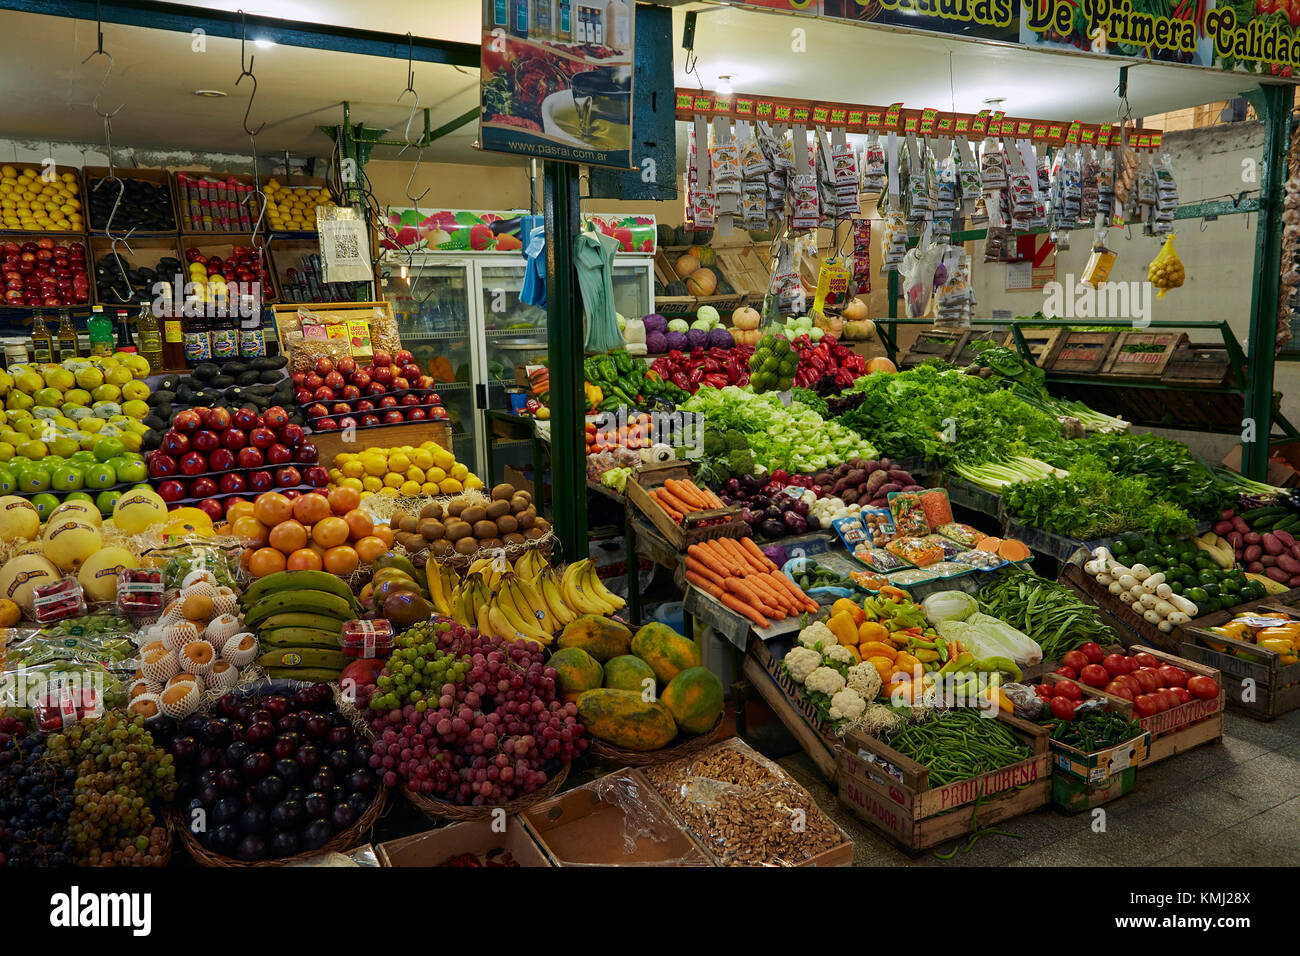 Produce stall, San Telmo Market, San Telmo, Buenos Aires, Argentina, South America - Stock Image